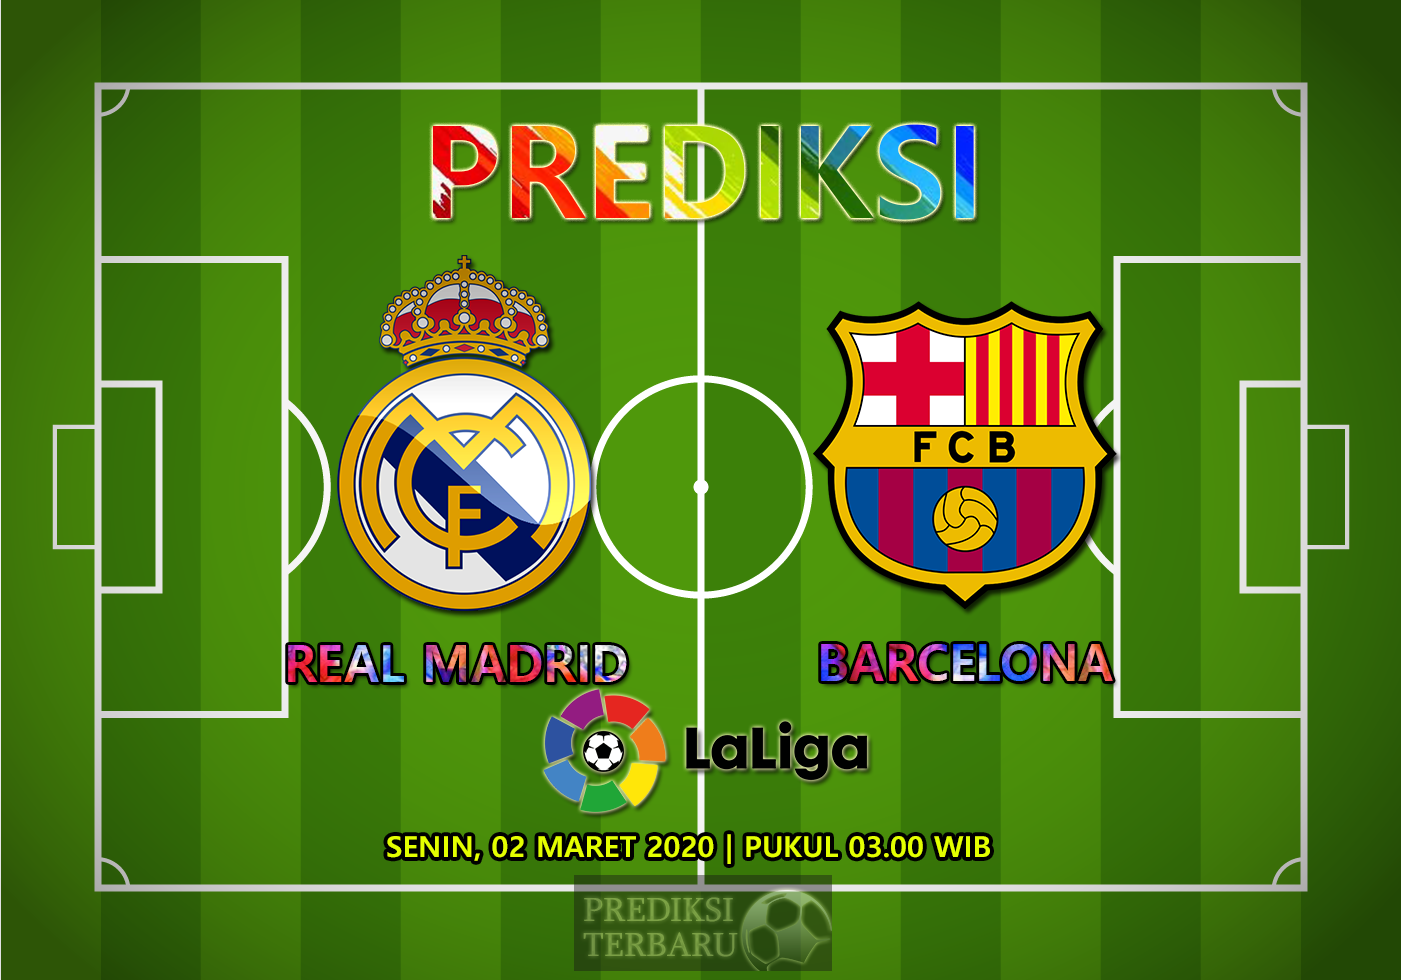 Prediksi Real Madrid Vs Barcelona Senin 02 Maret